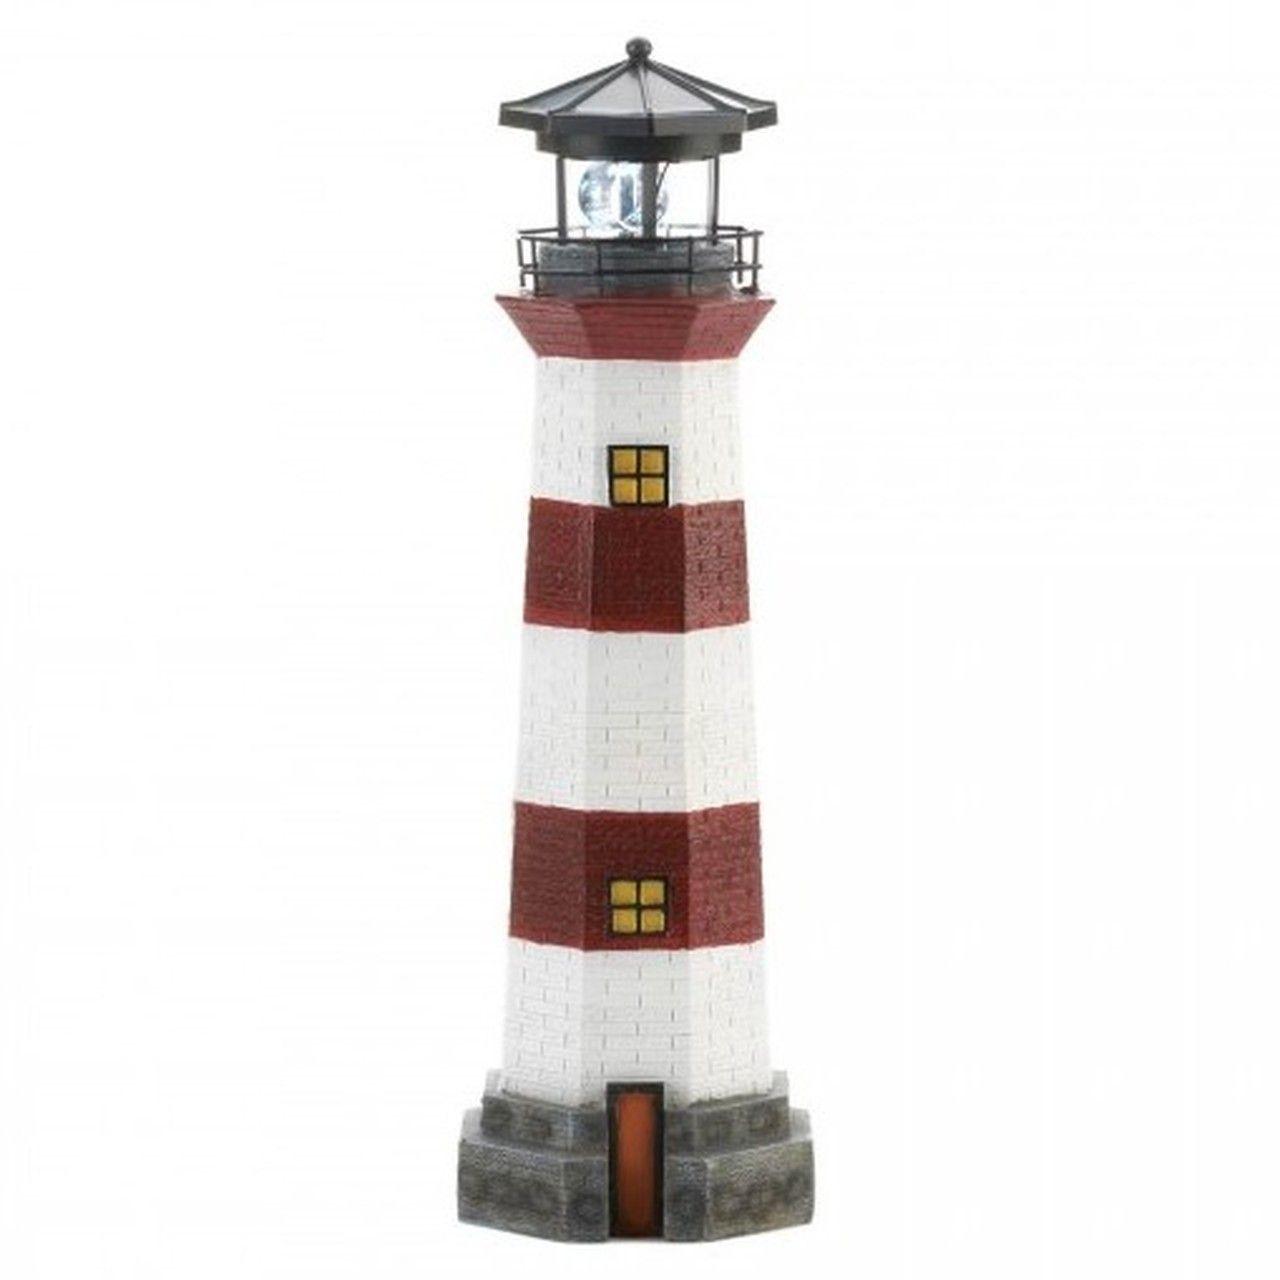 Lighthouse Garden Decor With Solar Powered Spinning Light